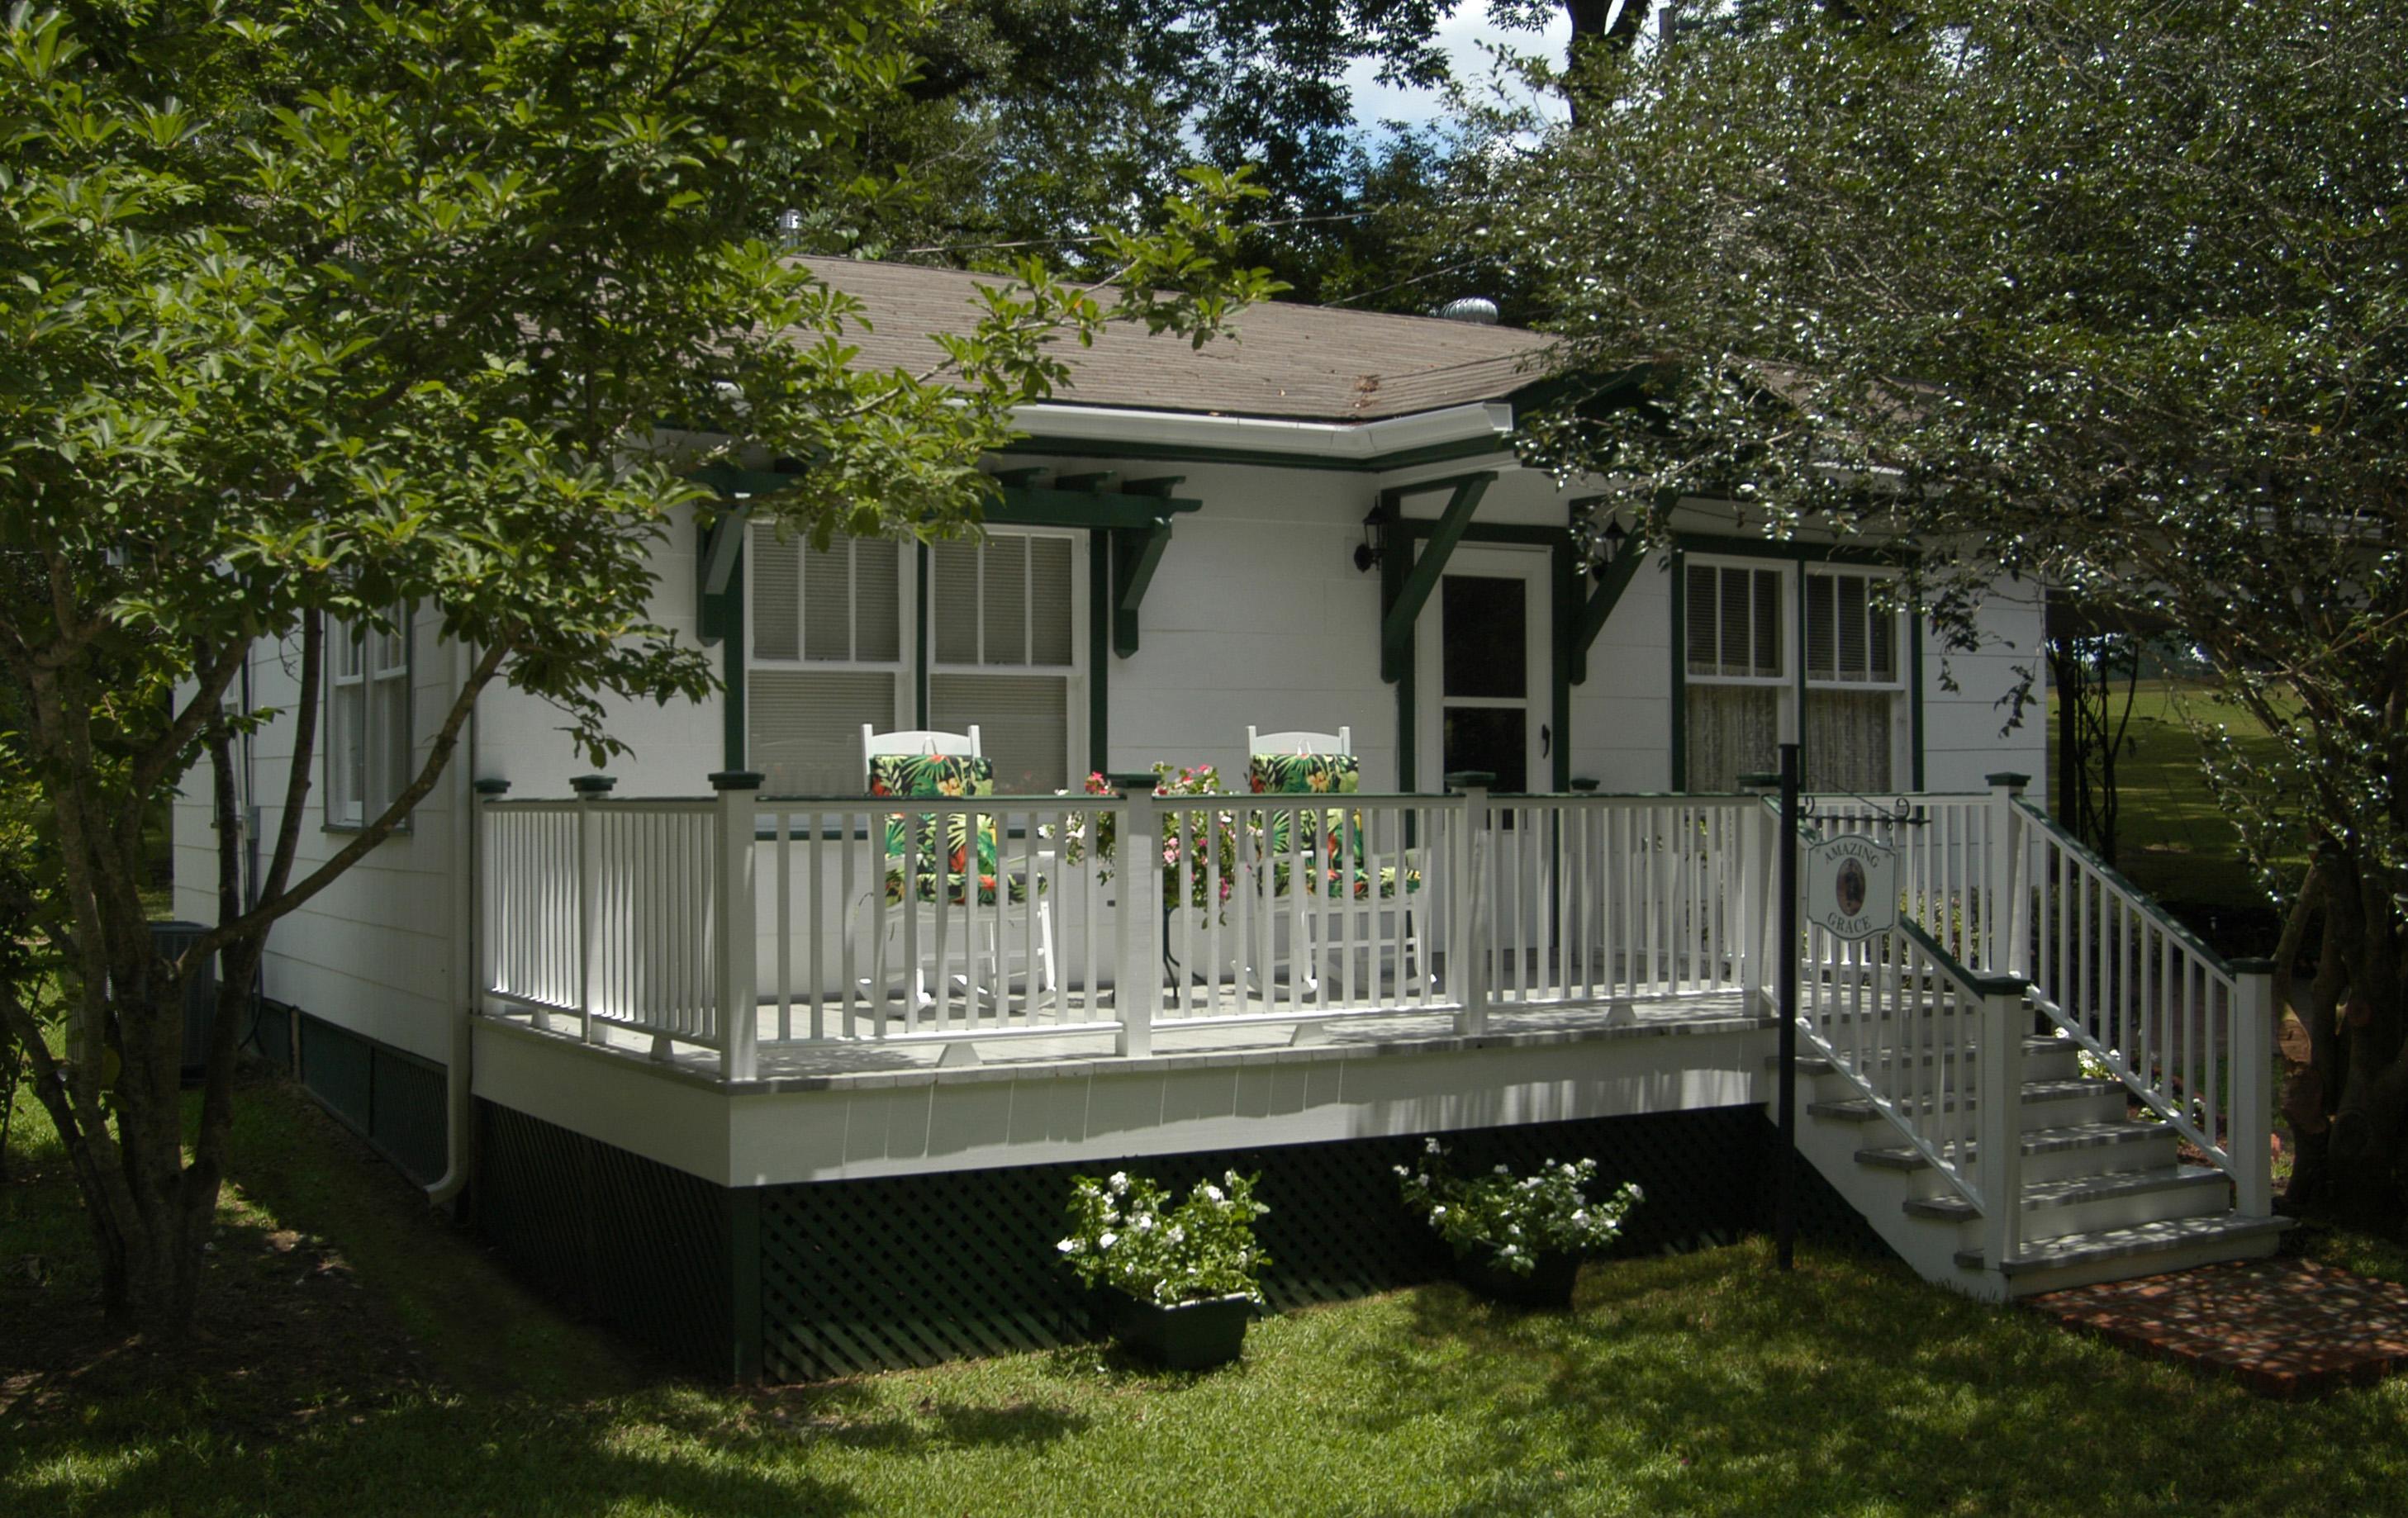 cabin cottage rentals lodging natchez trace parkway natchez trace parkway